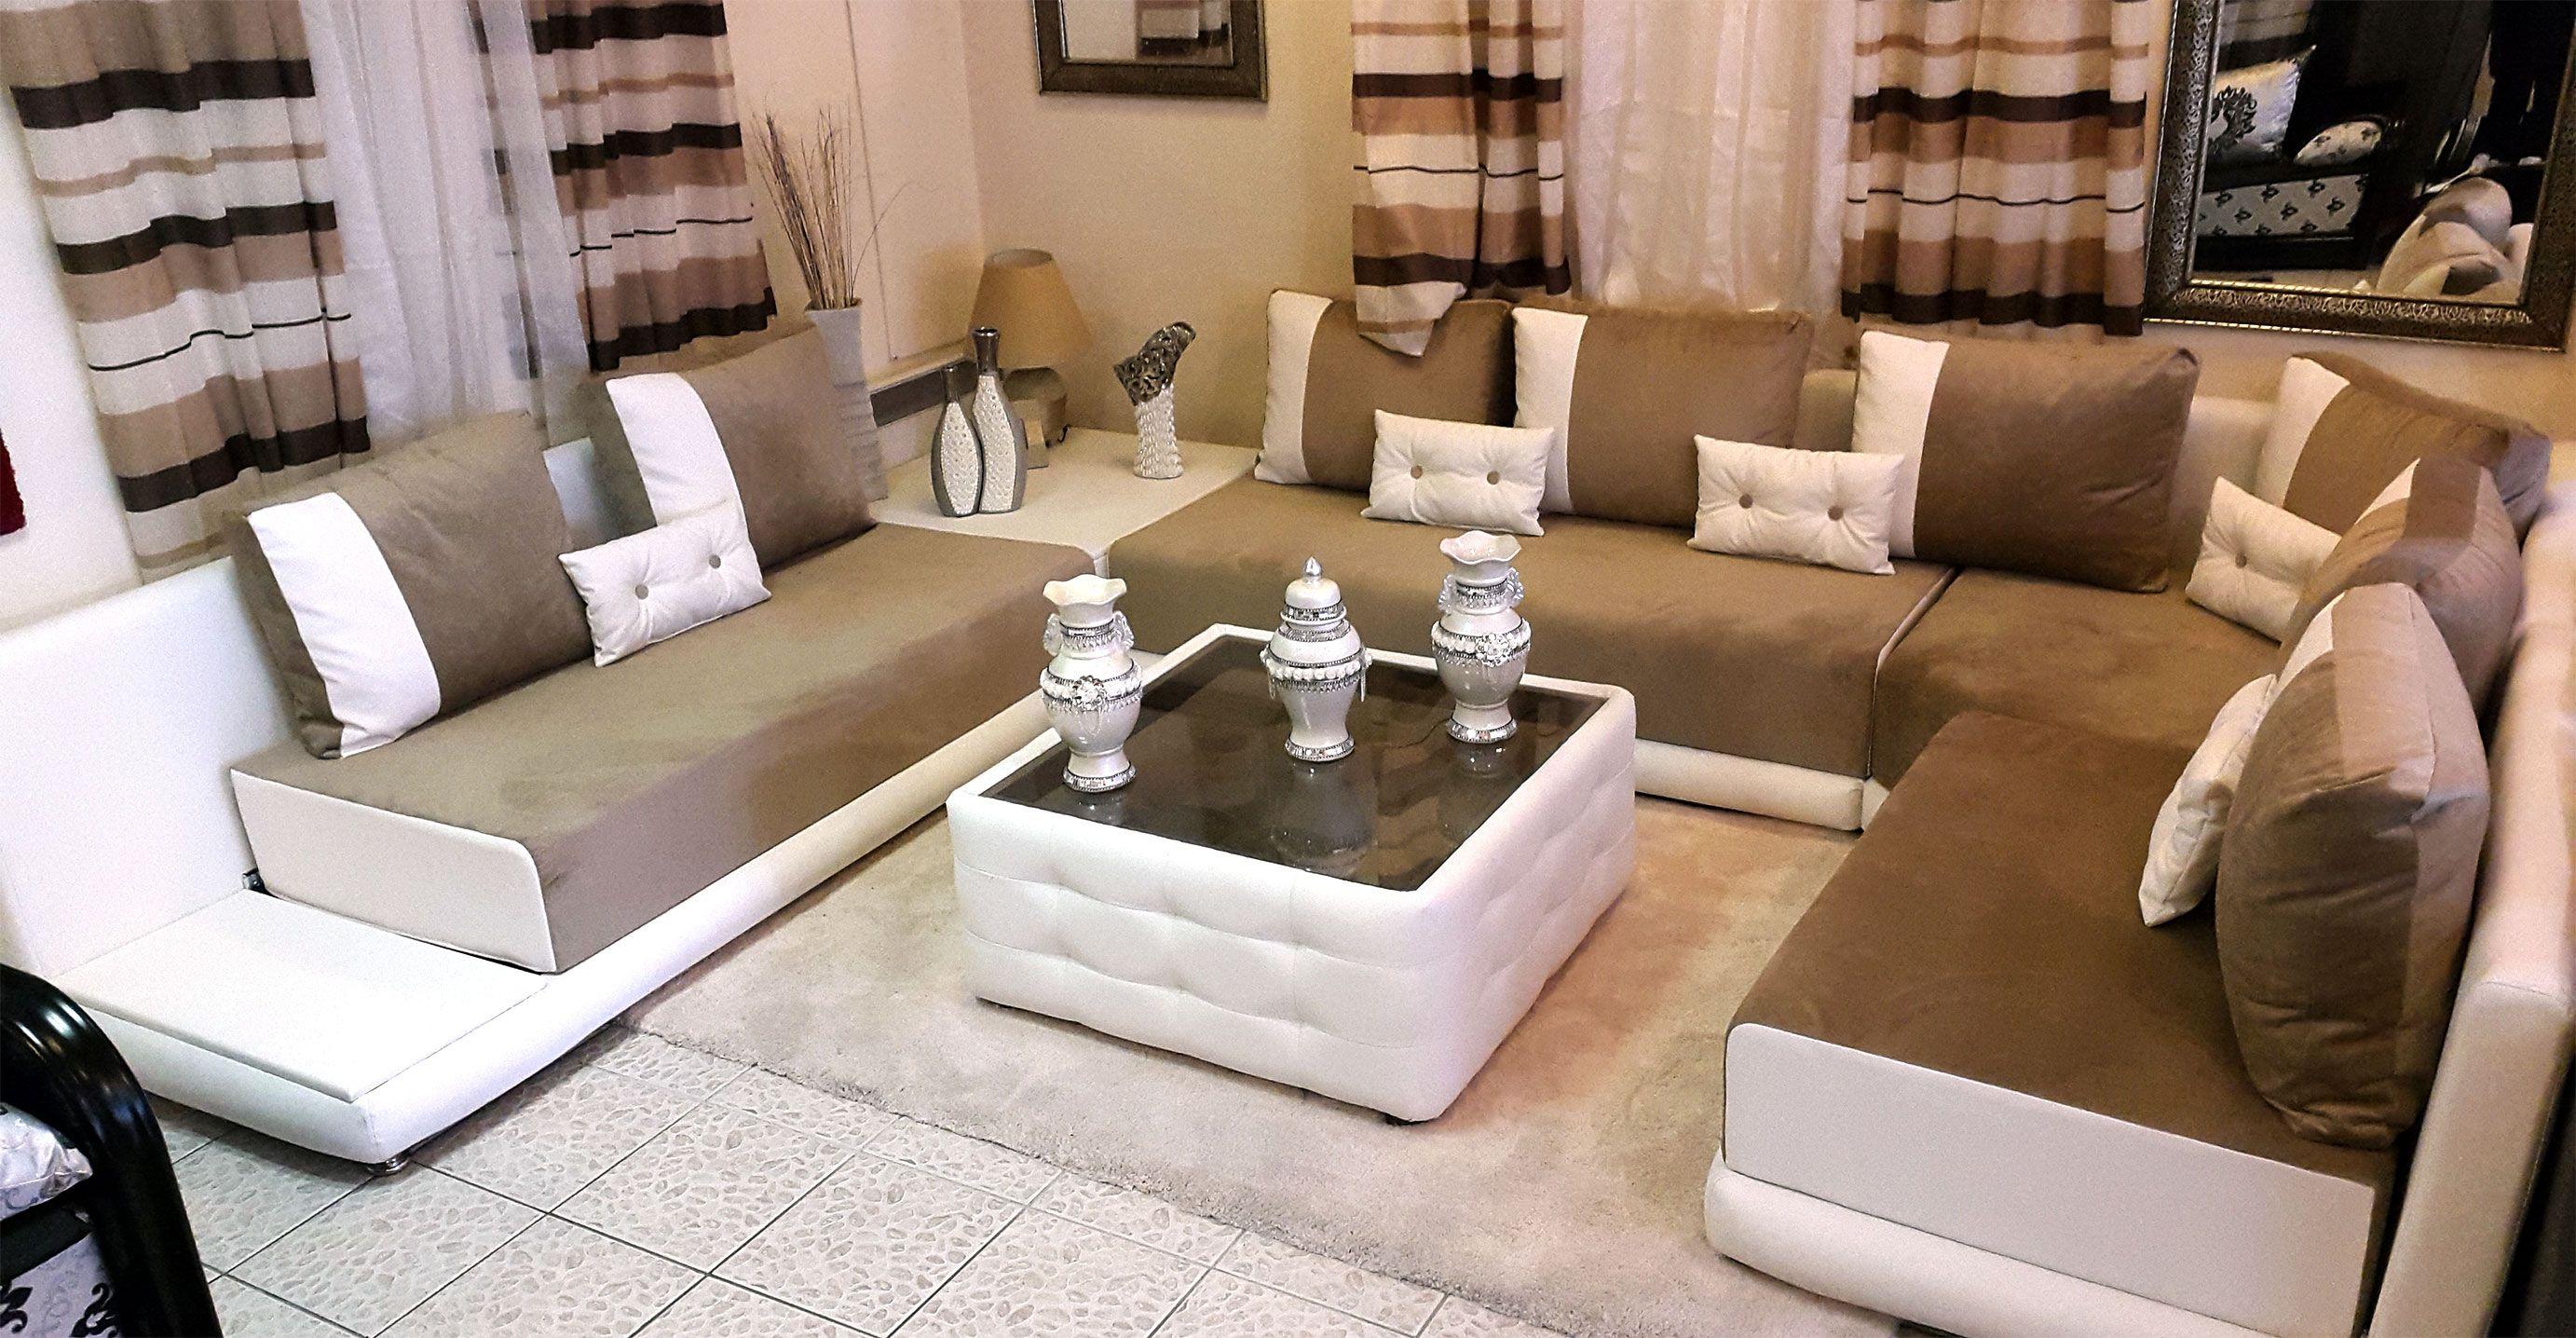 salon s jour marocain 2018 expert decorator d coration salon house. Black Bedroom Furniture Sets. Home Design Ideas